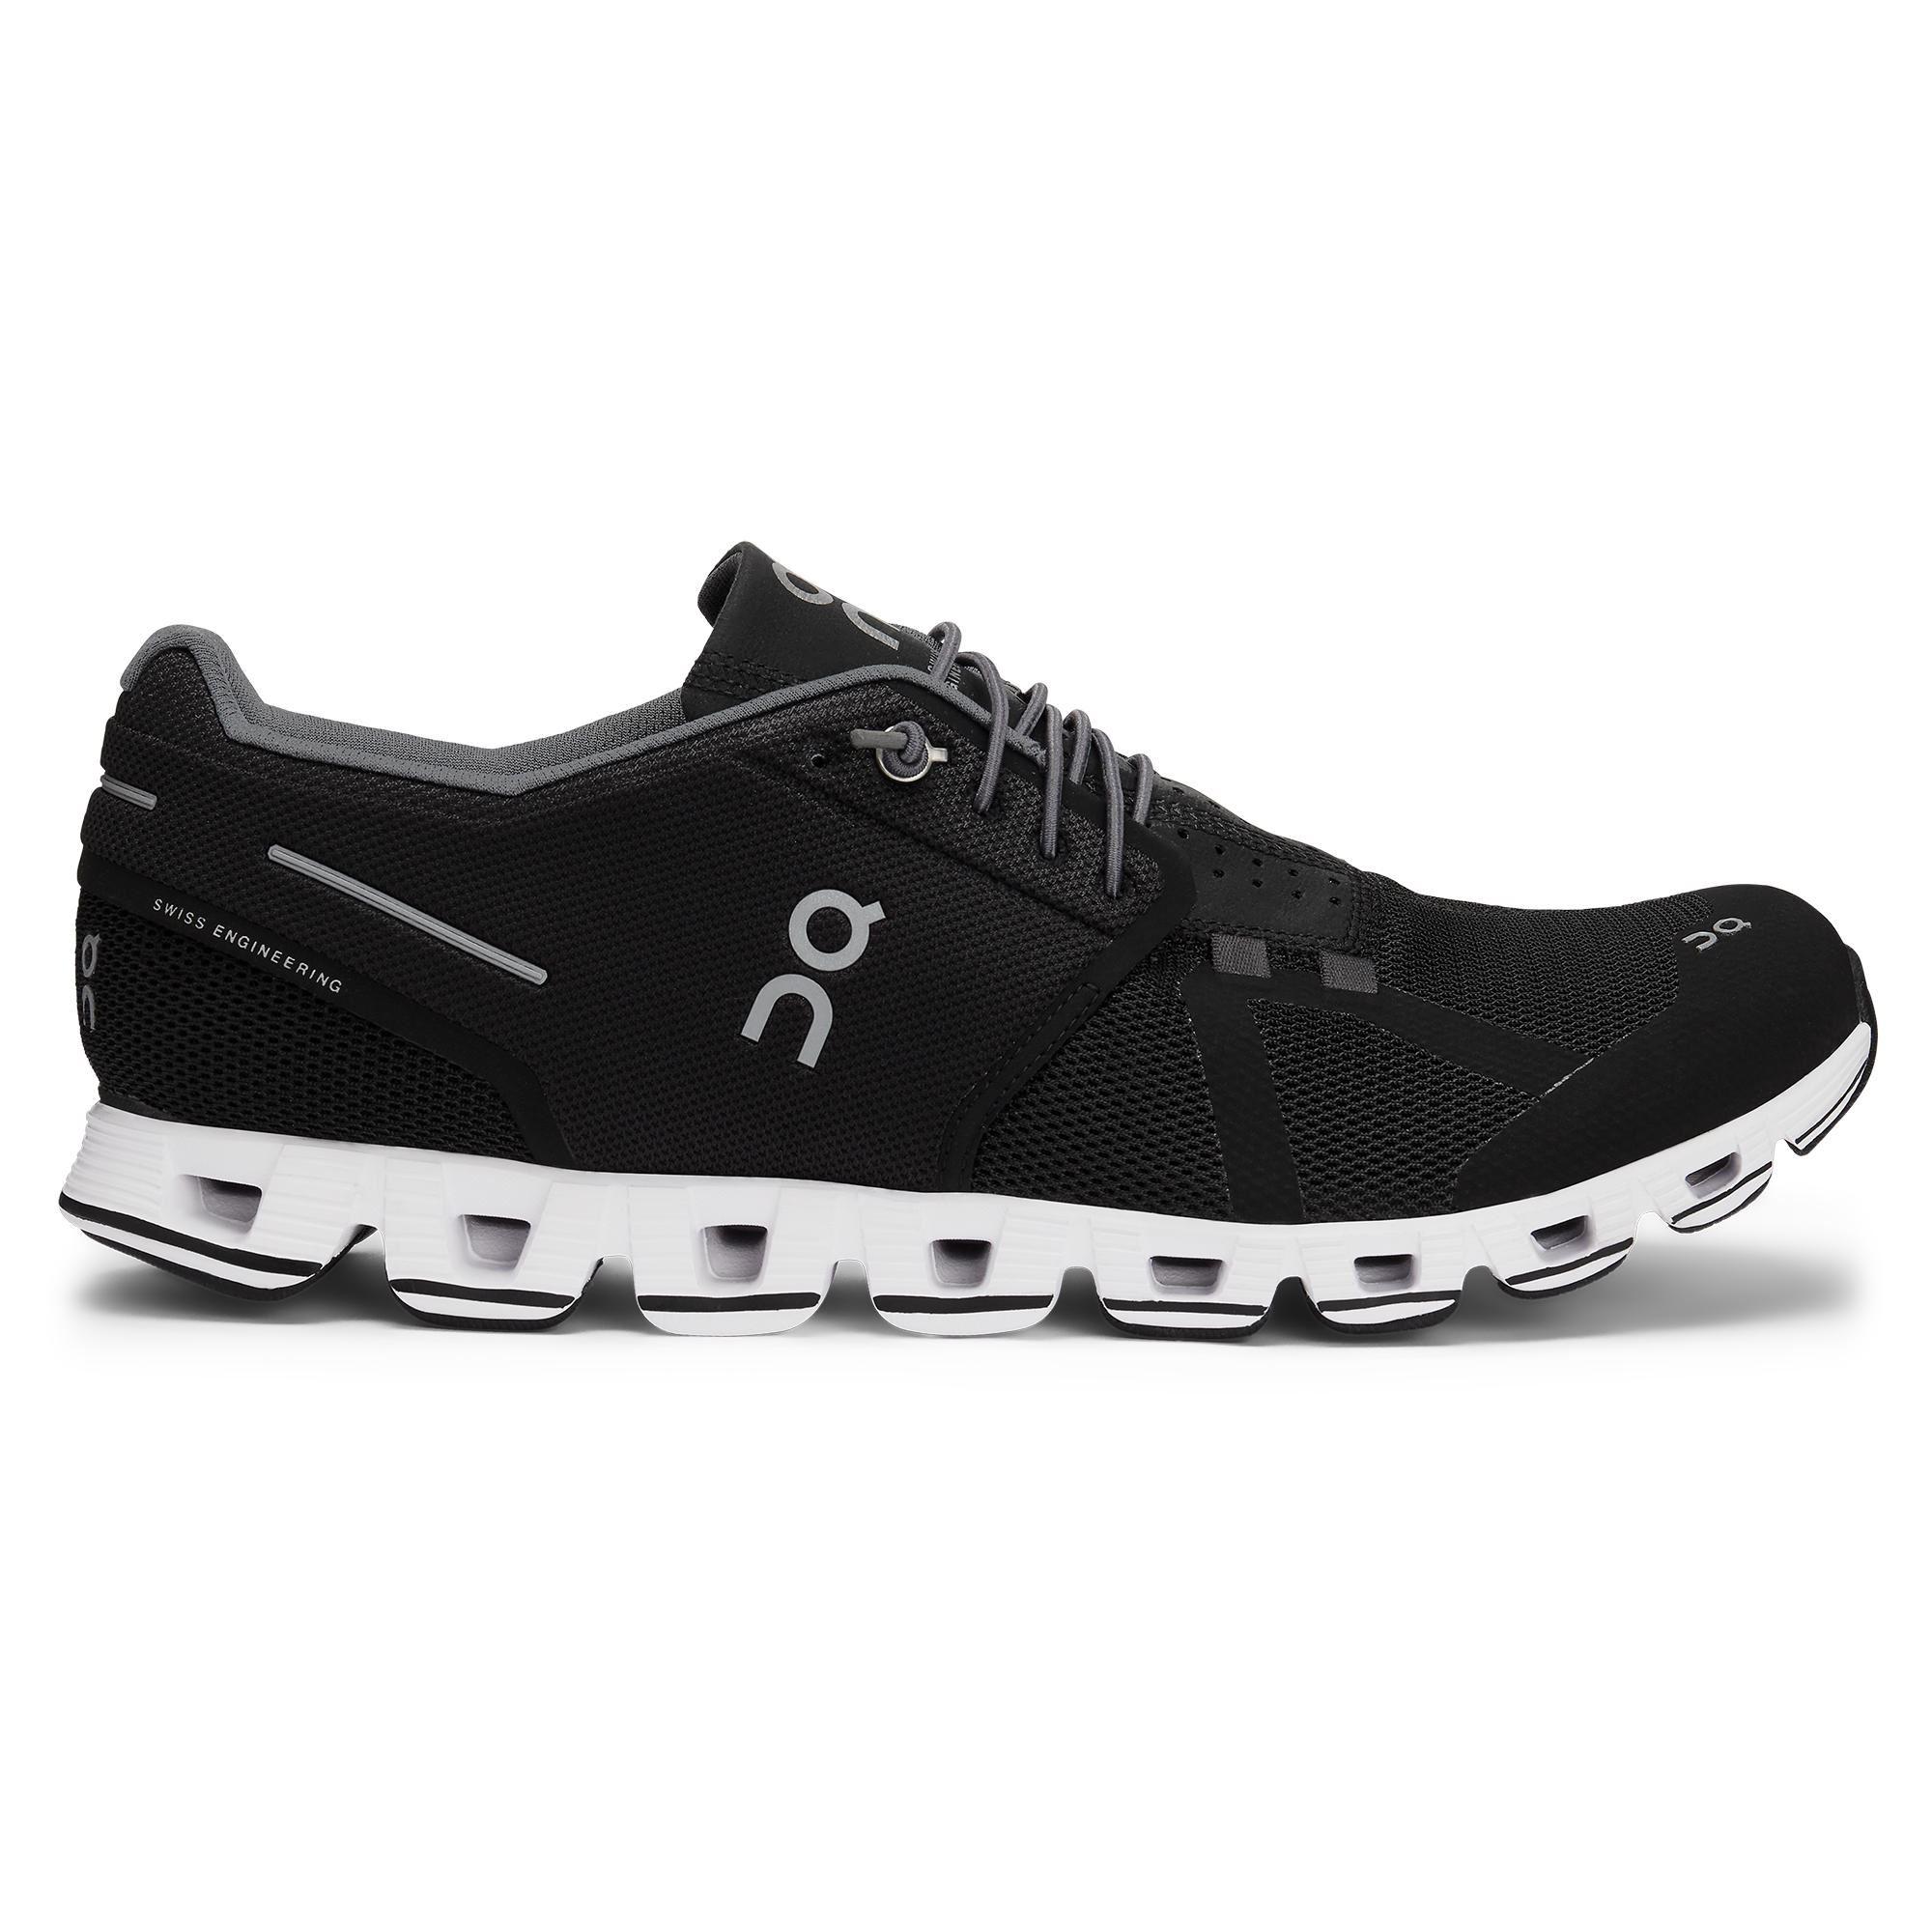 Cloud Running Shoe - Men's